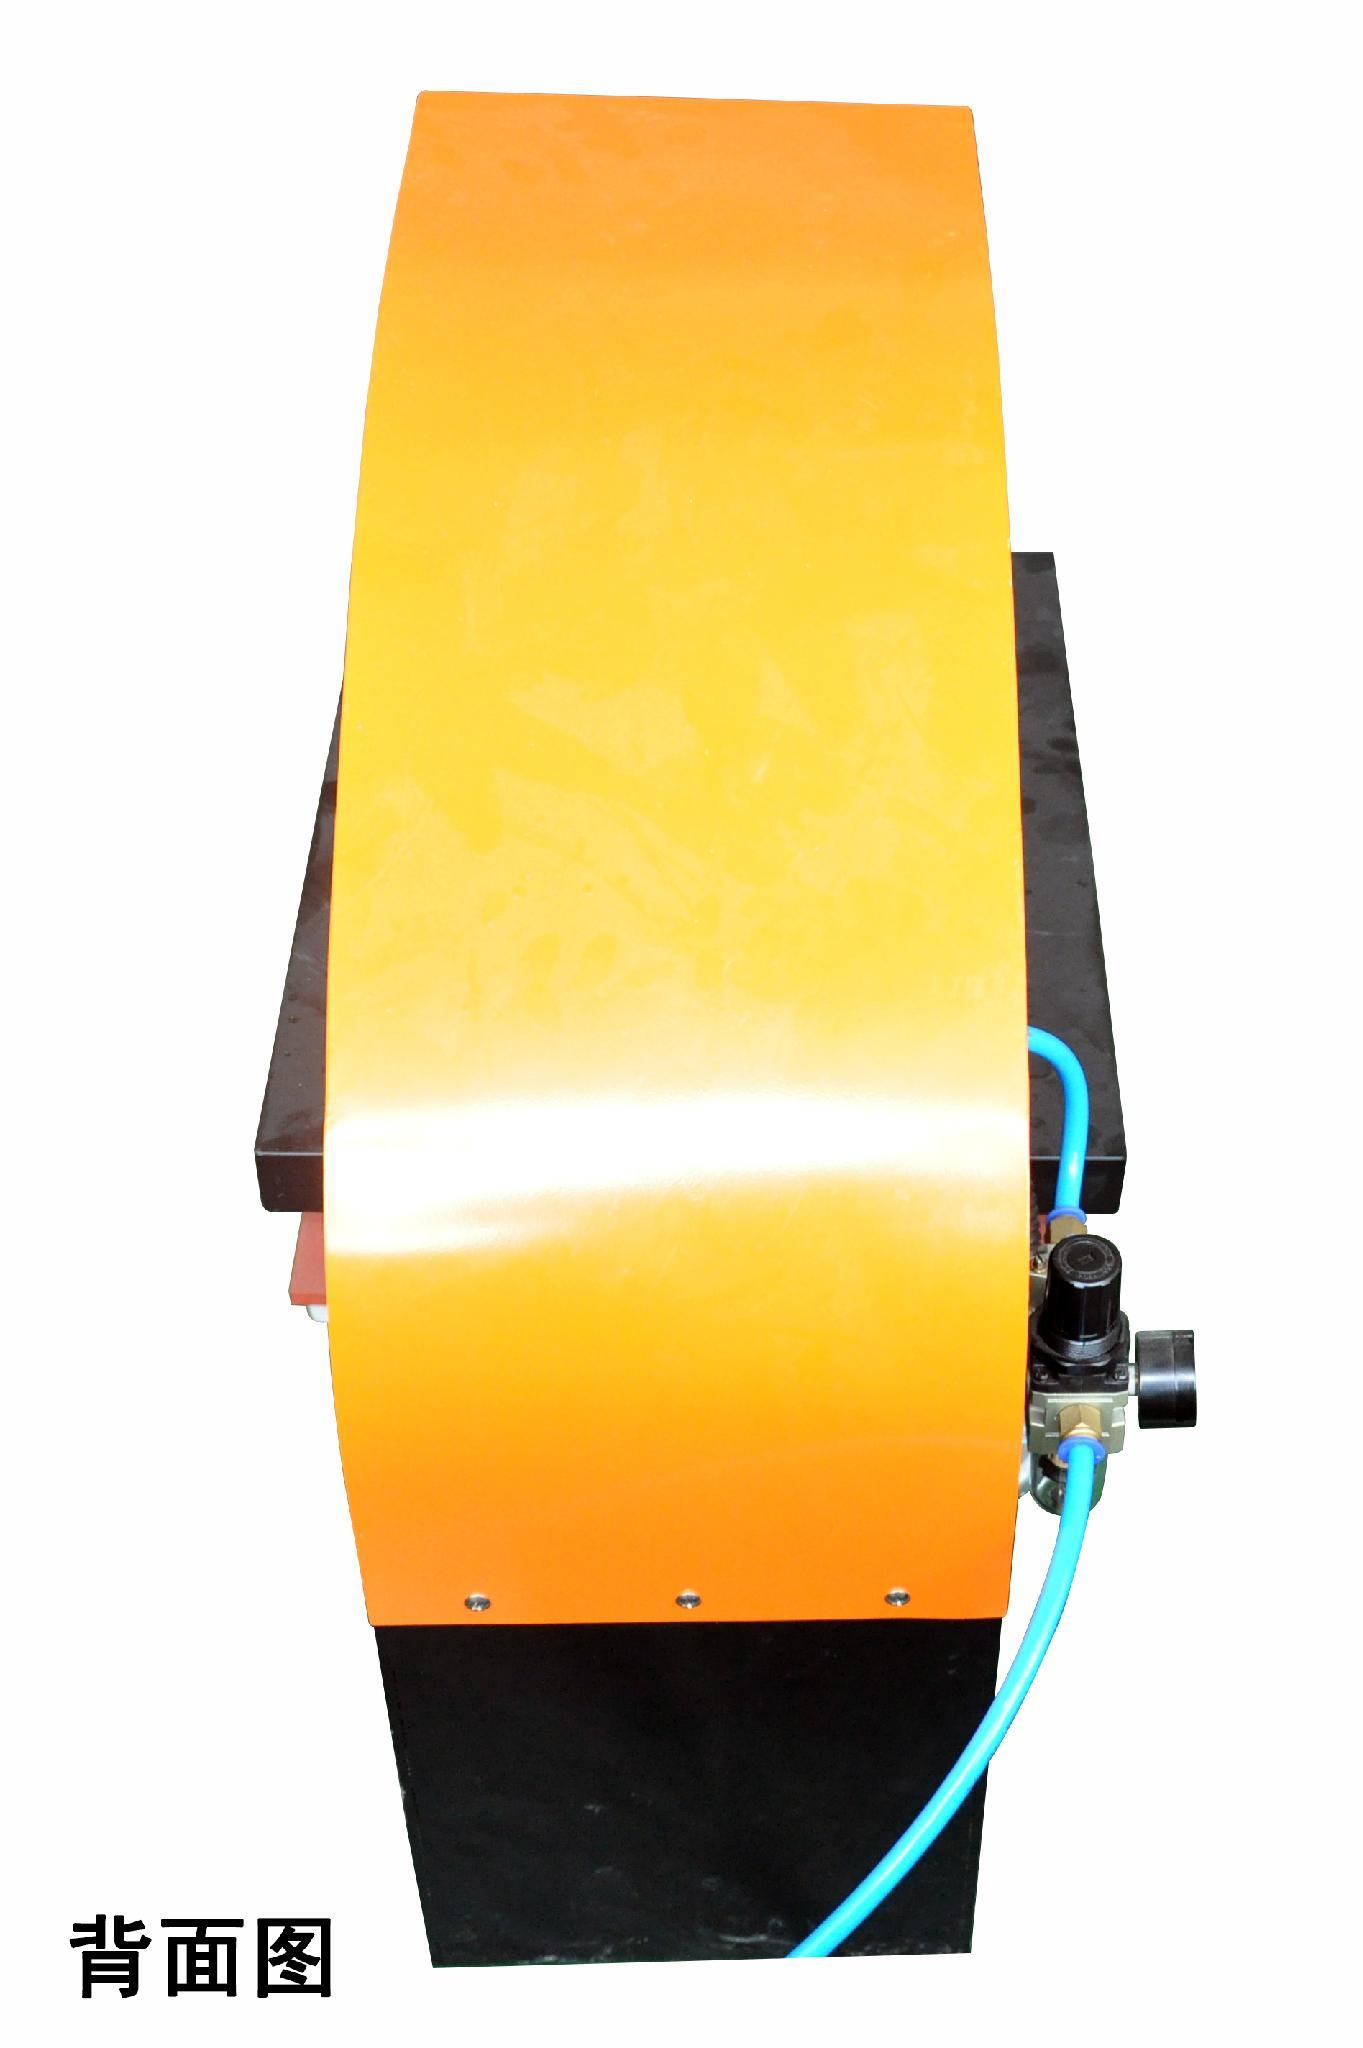 60*80cm A8气动单工位烫画机 11